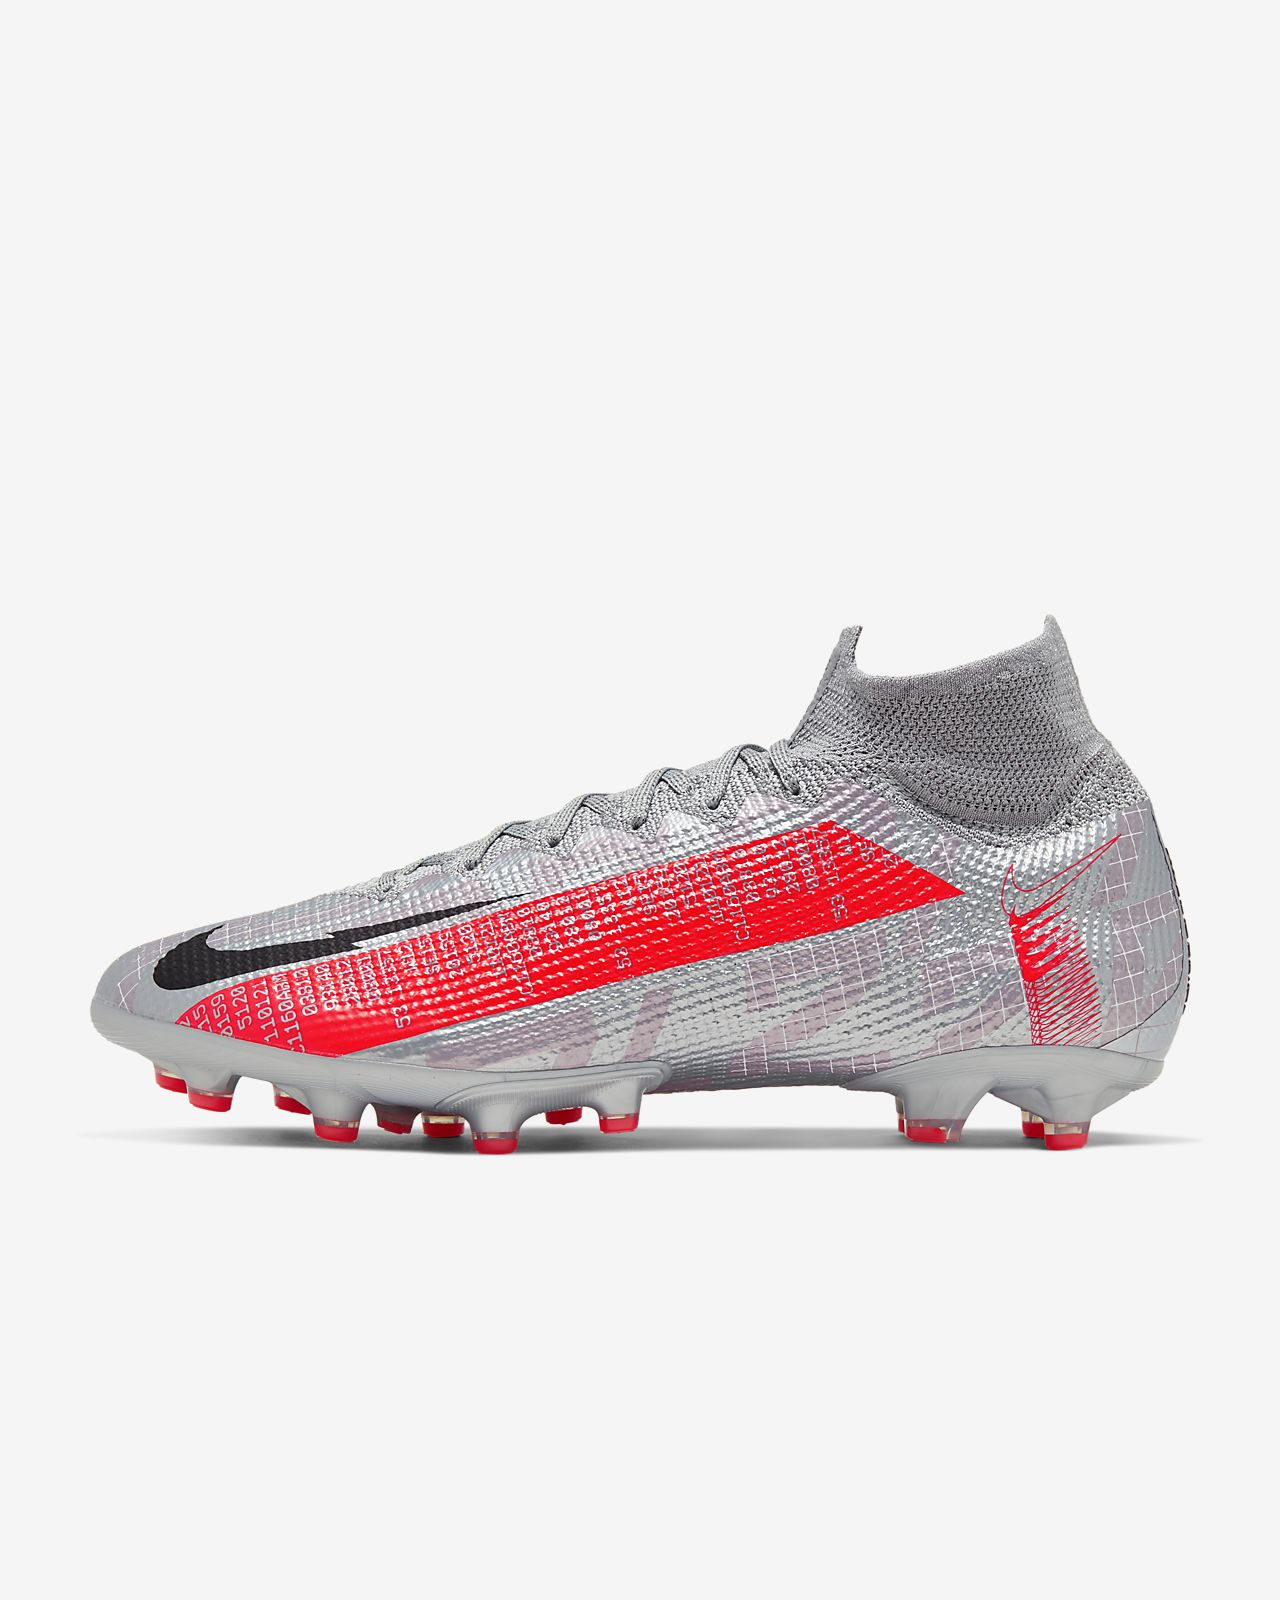 Scarpe Calcio Nike Mercurial Superfly 360 Elite Ag pro M